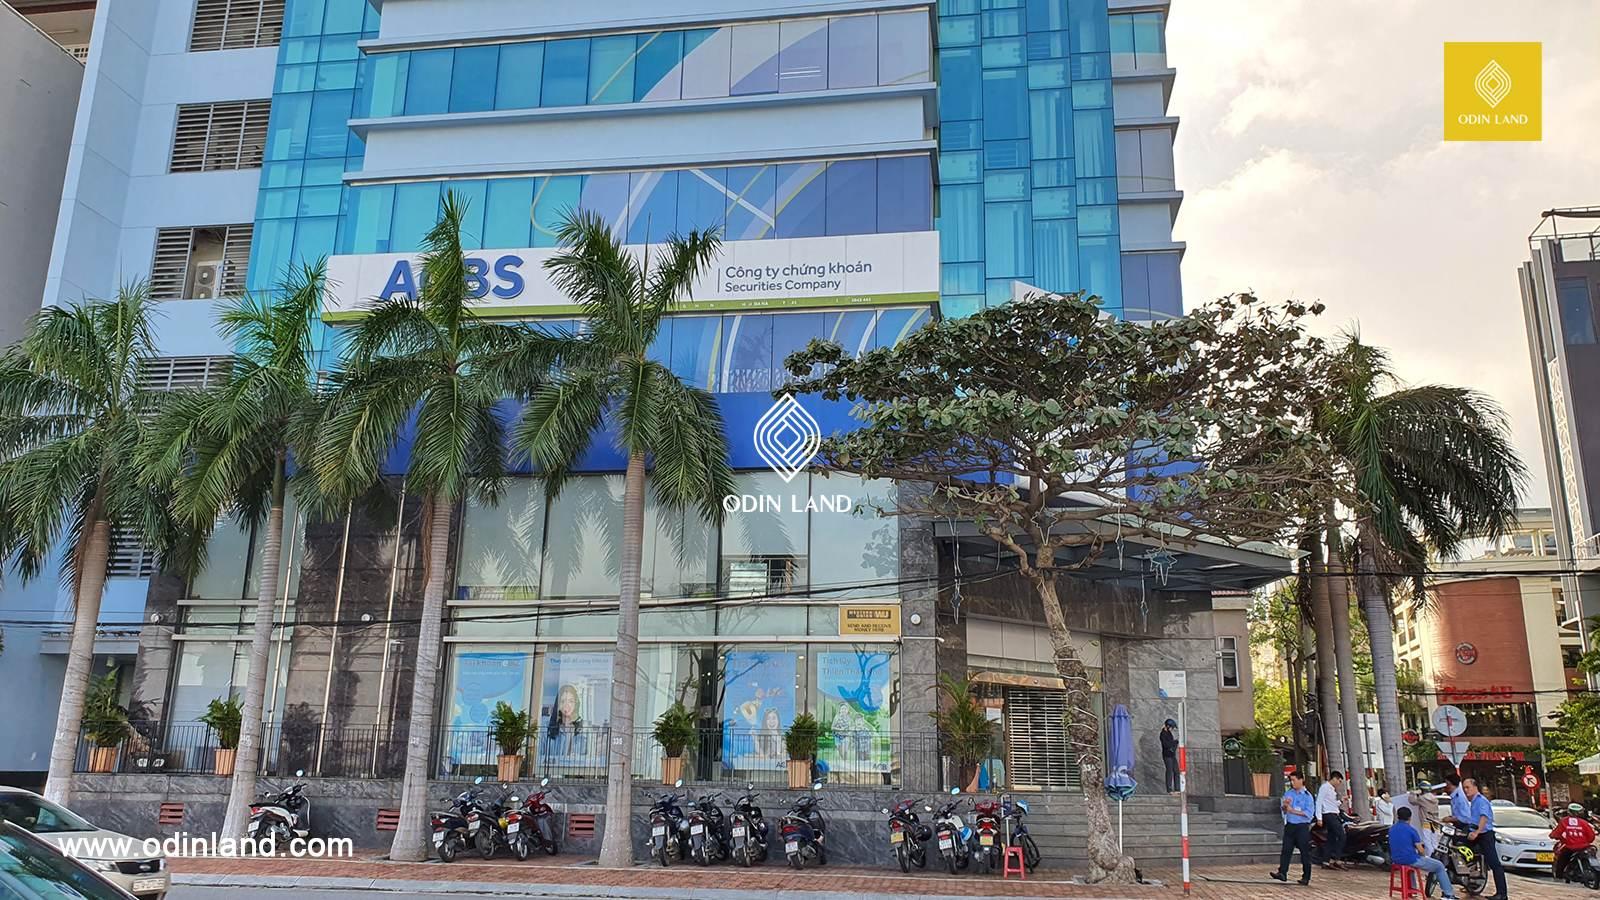 Van Phong Cho Thue Toa Nha Acb Building 3